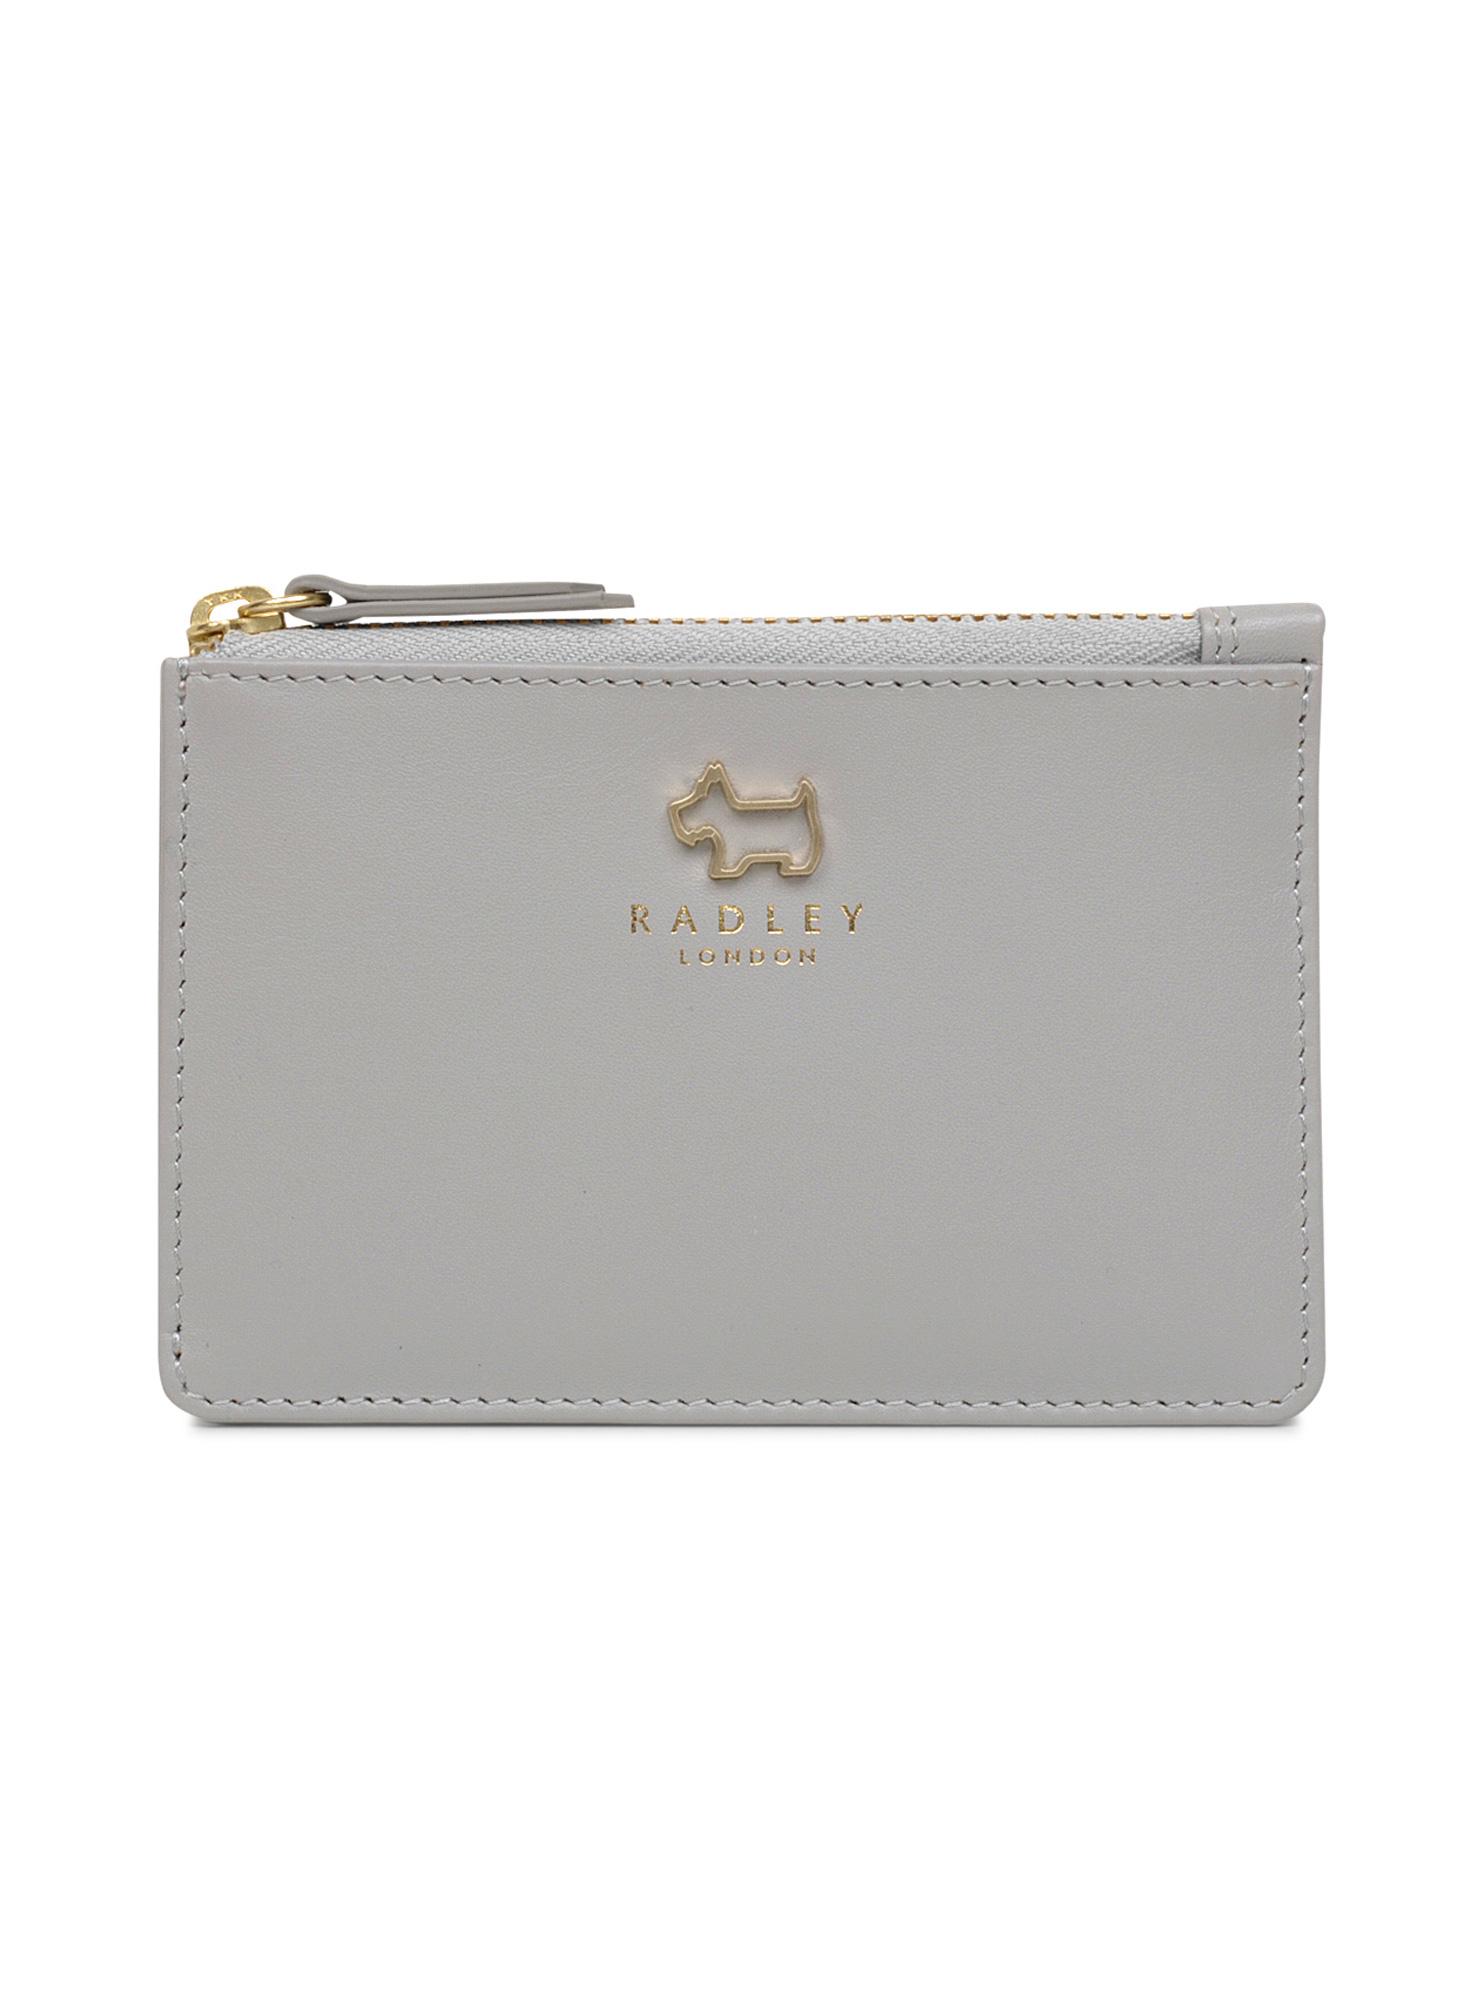 radley_accessories_RDL13811.jpg